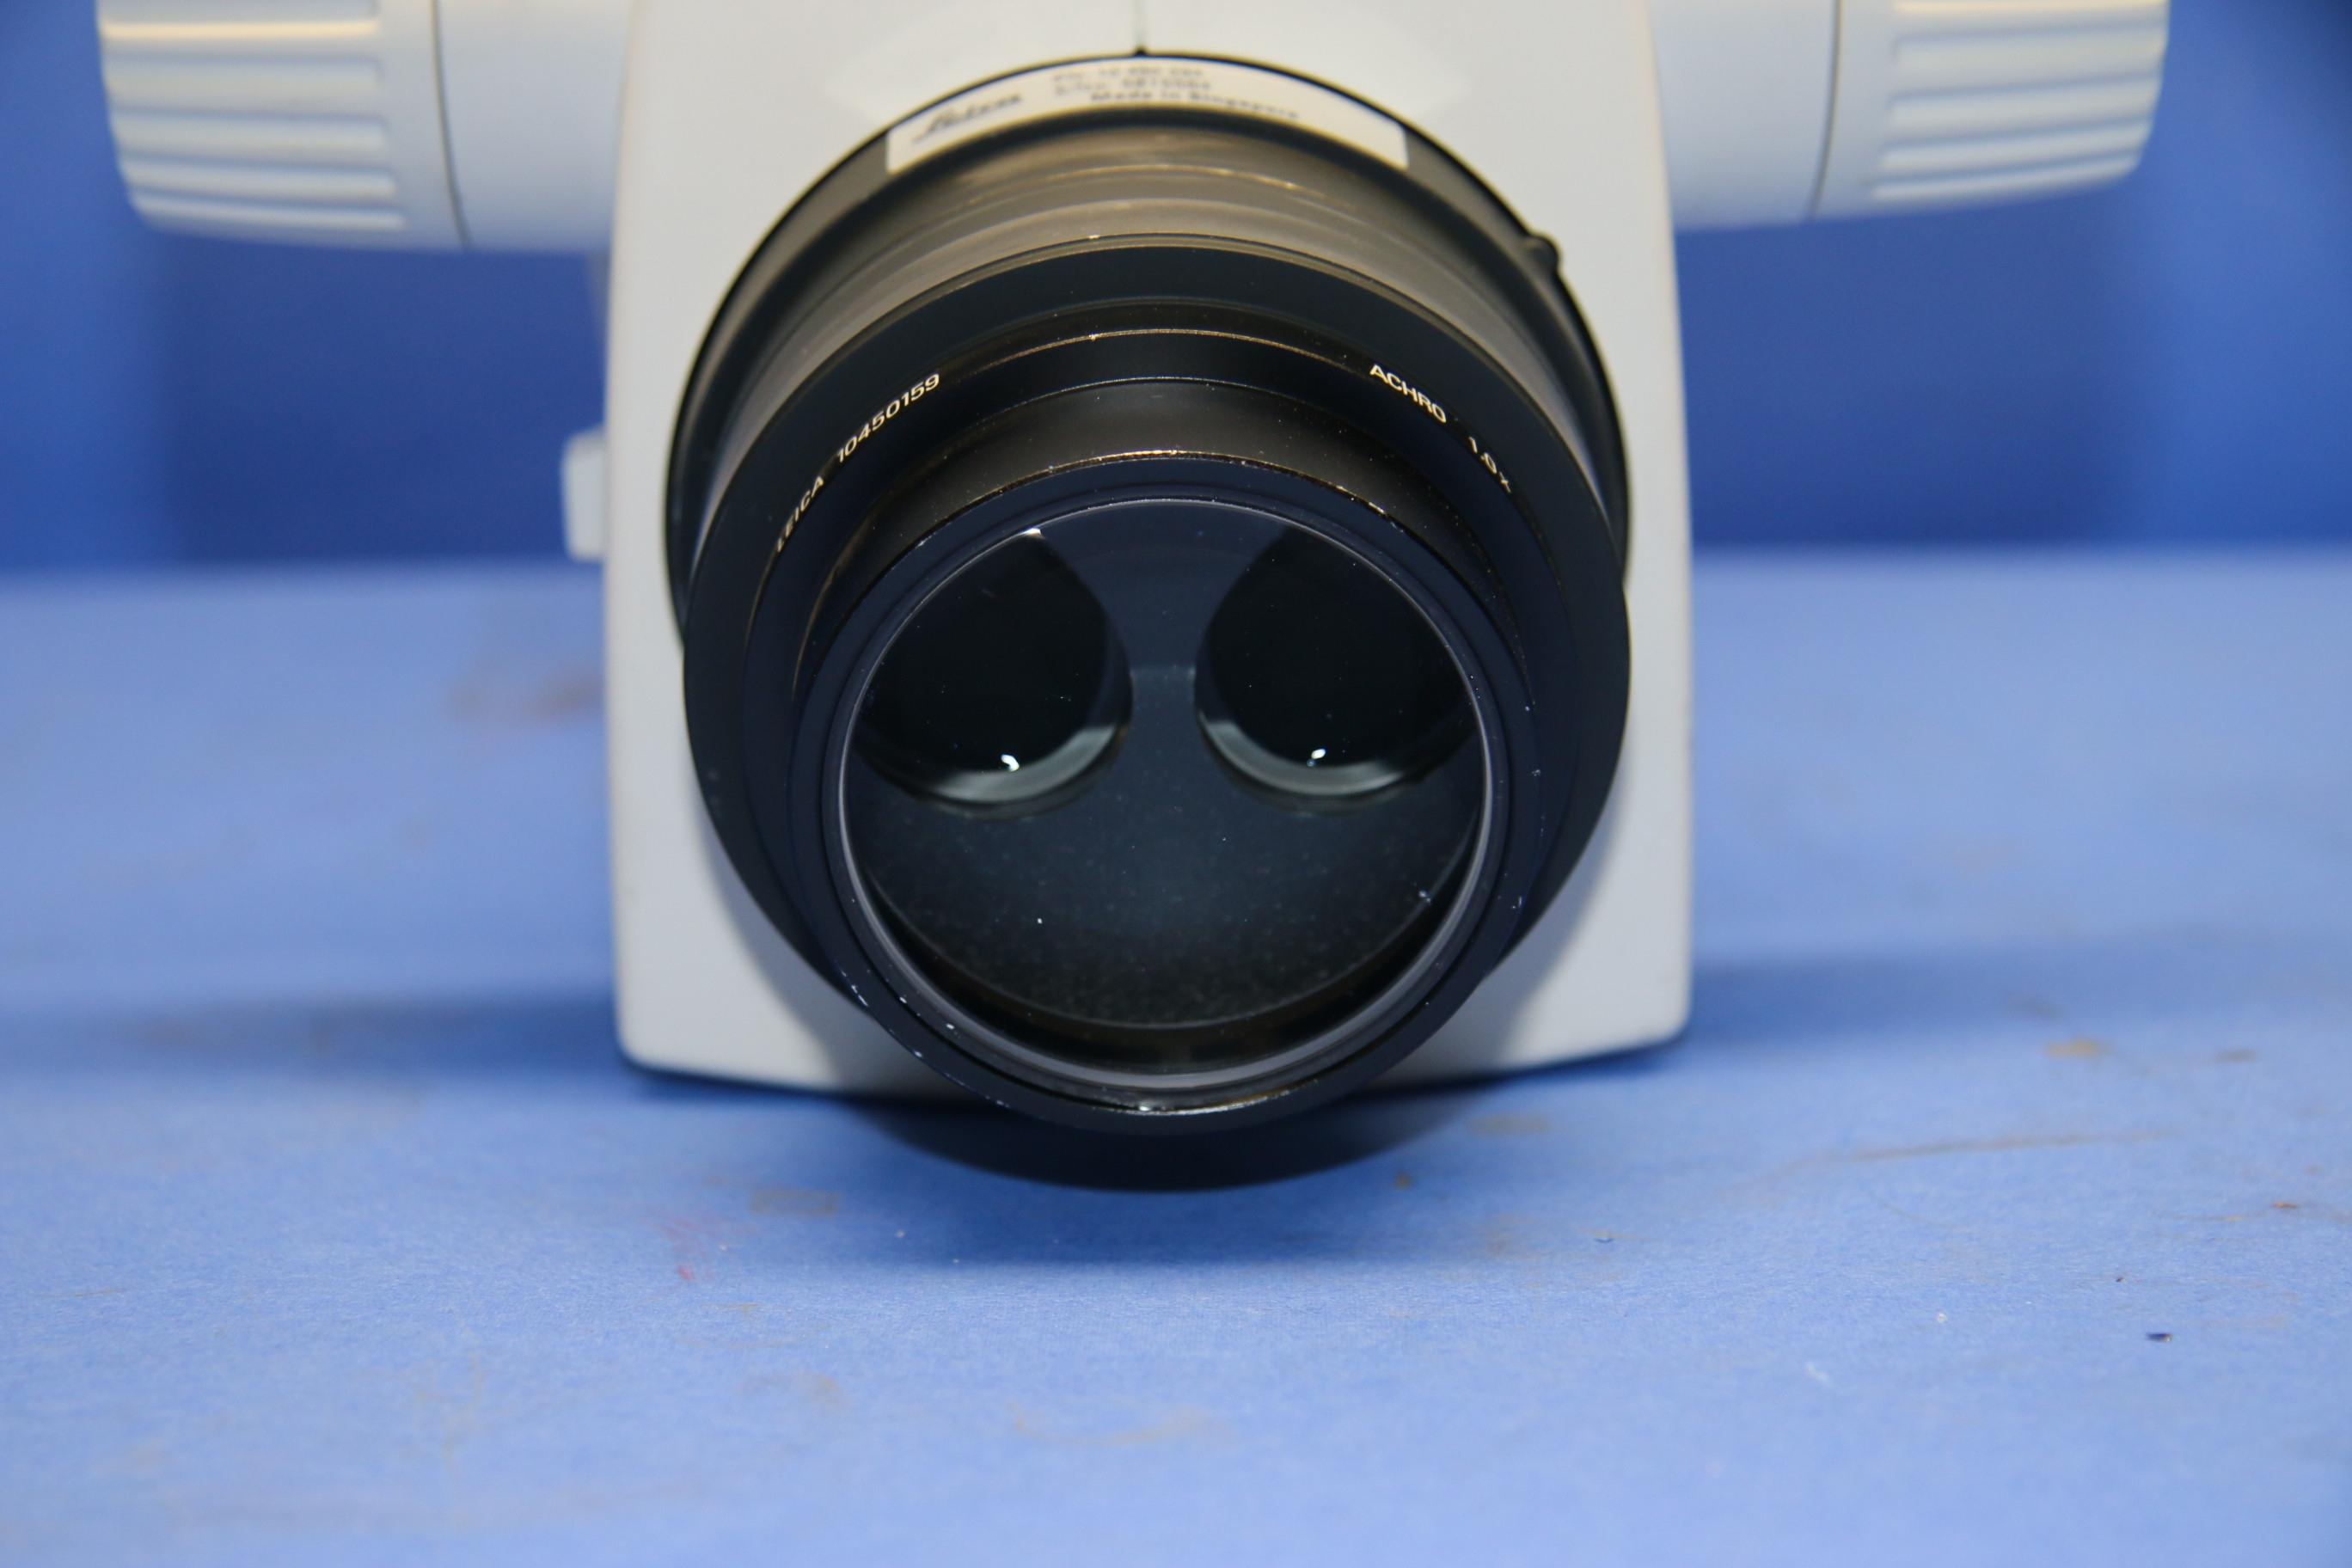 (1) Used Leica M60 Microscope+Lens w/Stereo 45 degree angle head 16433